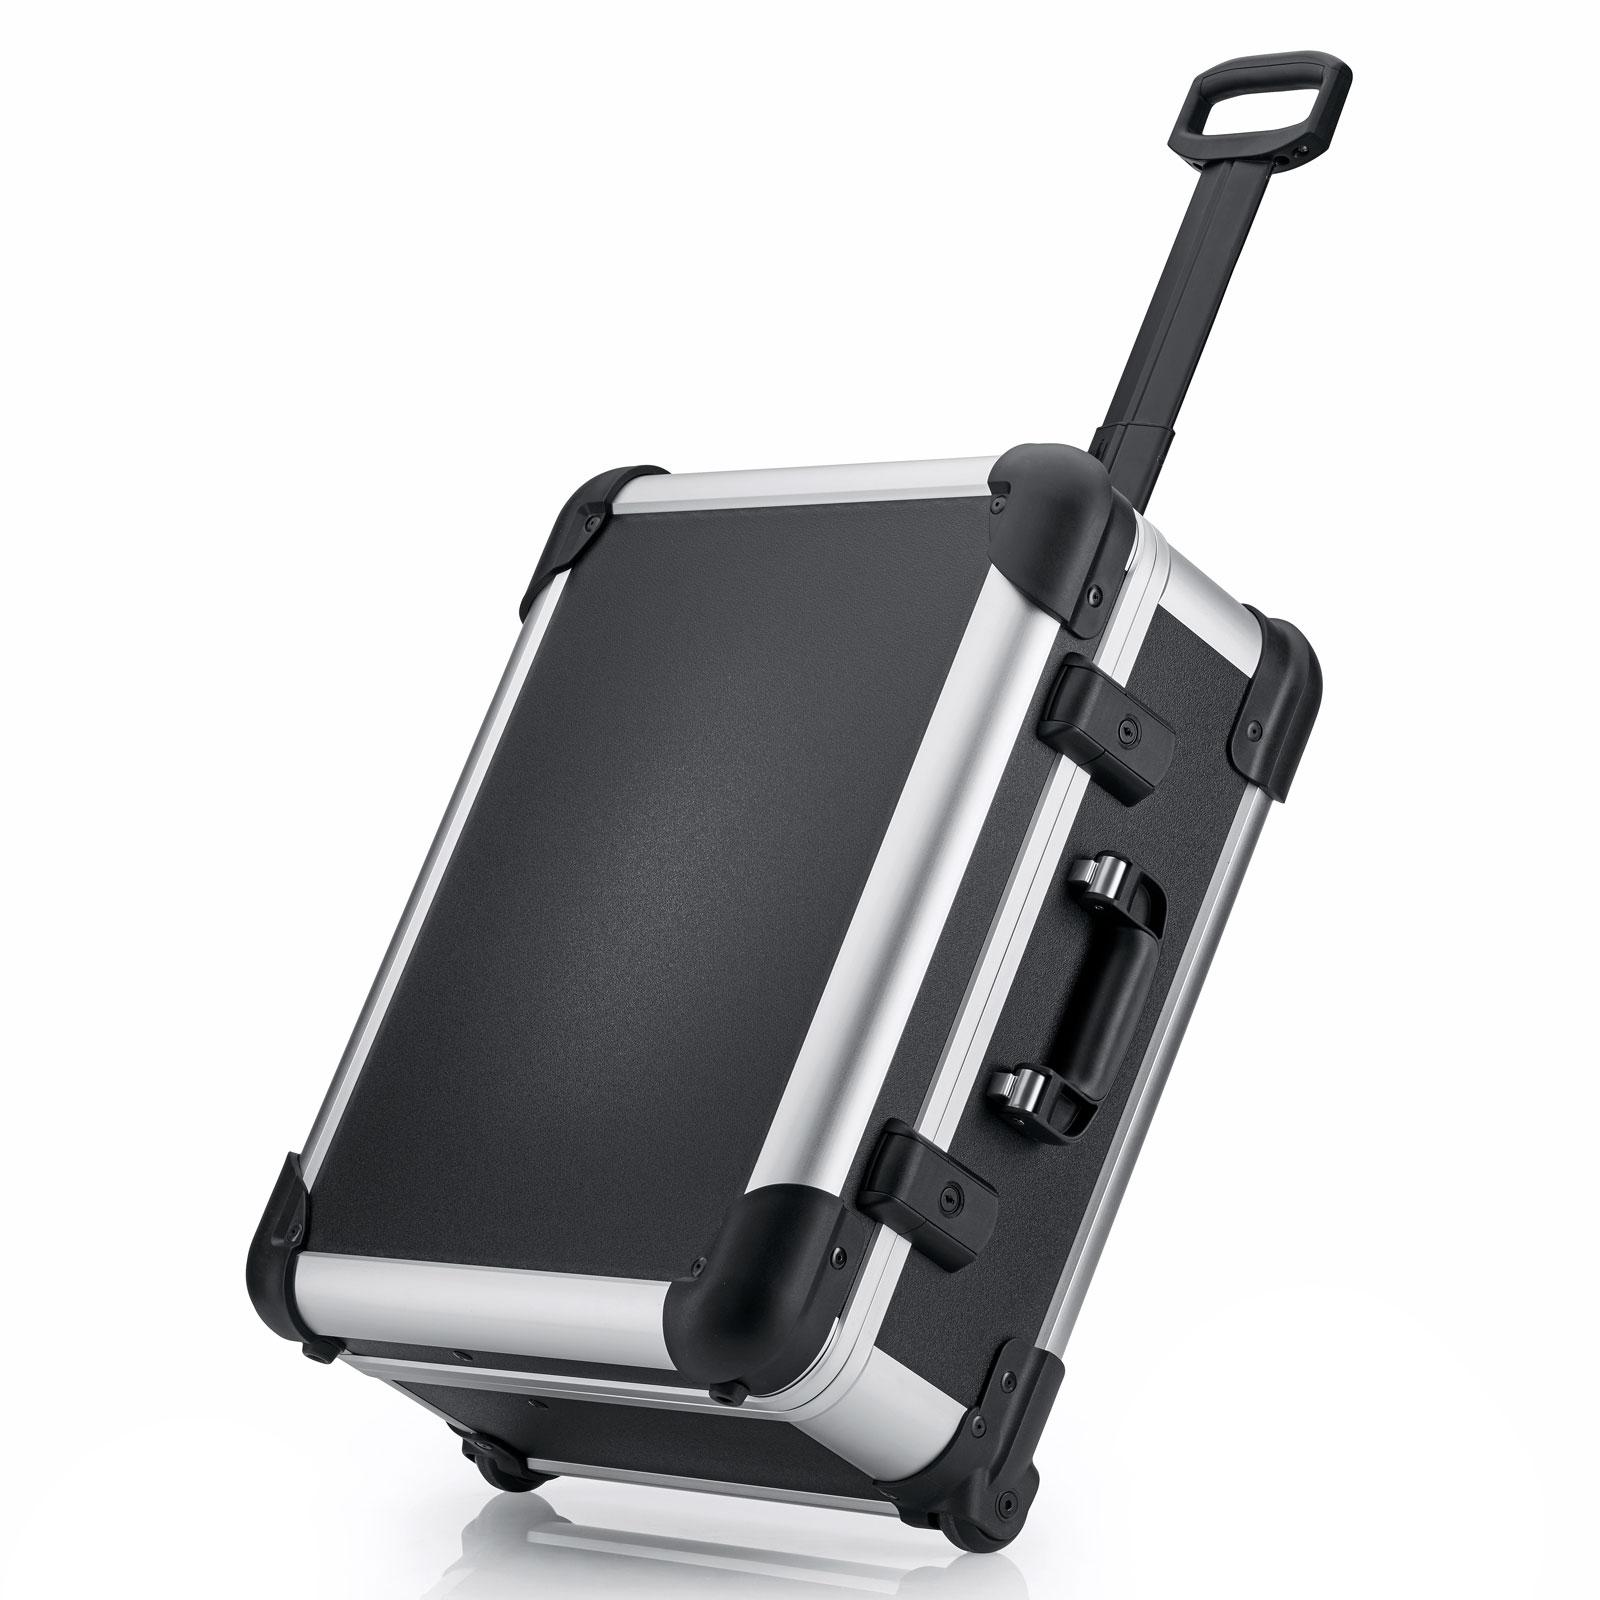 bwh Koffer  Robust Case Transportkoffer Typ 3 mit   Transportkoffer  2 Rollen